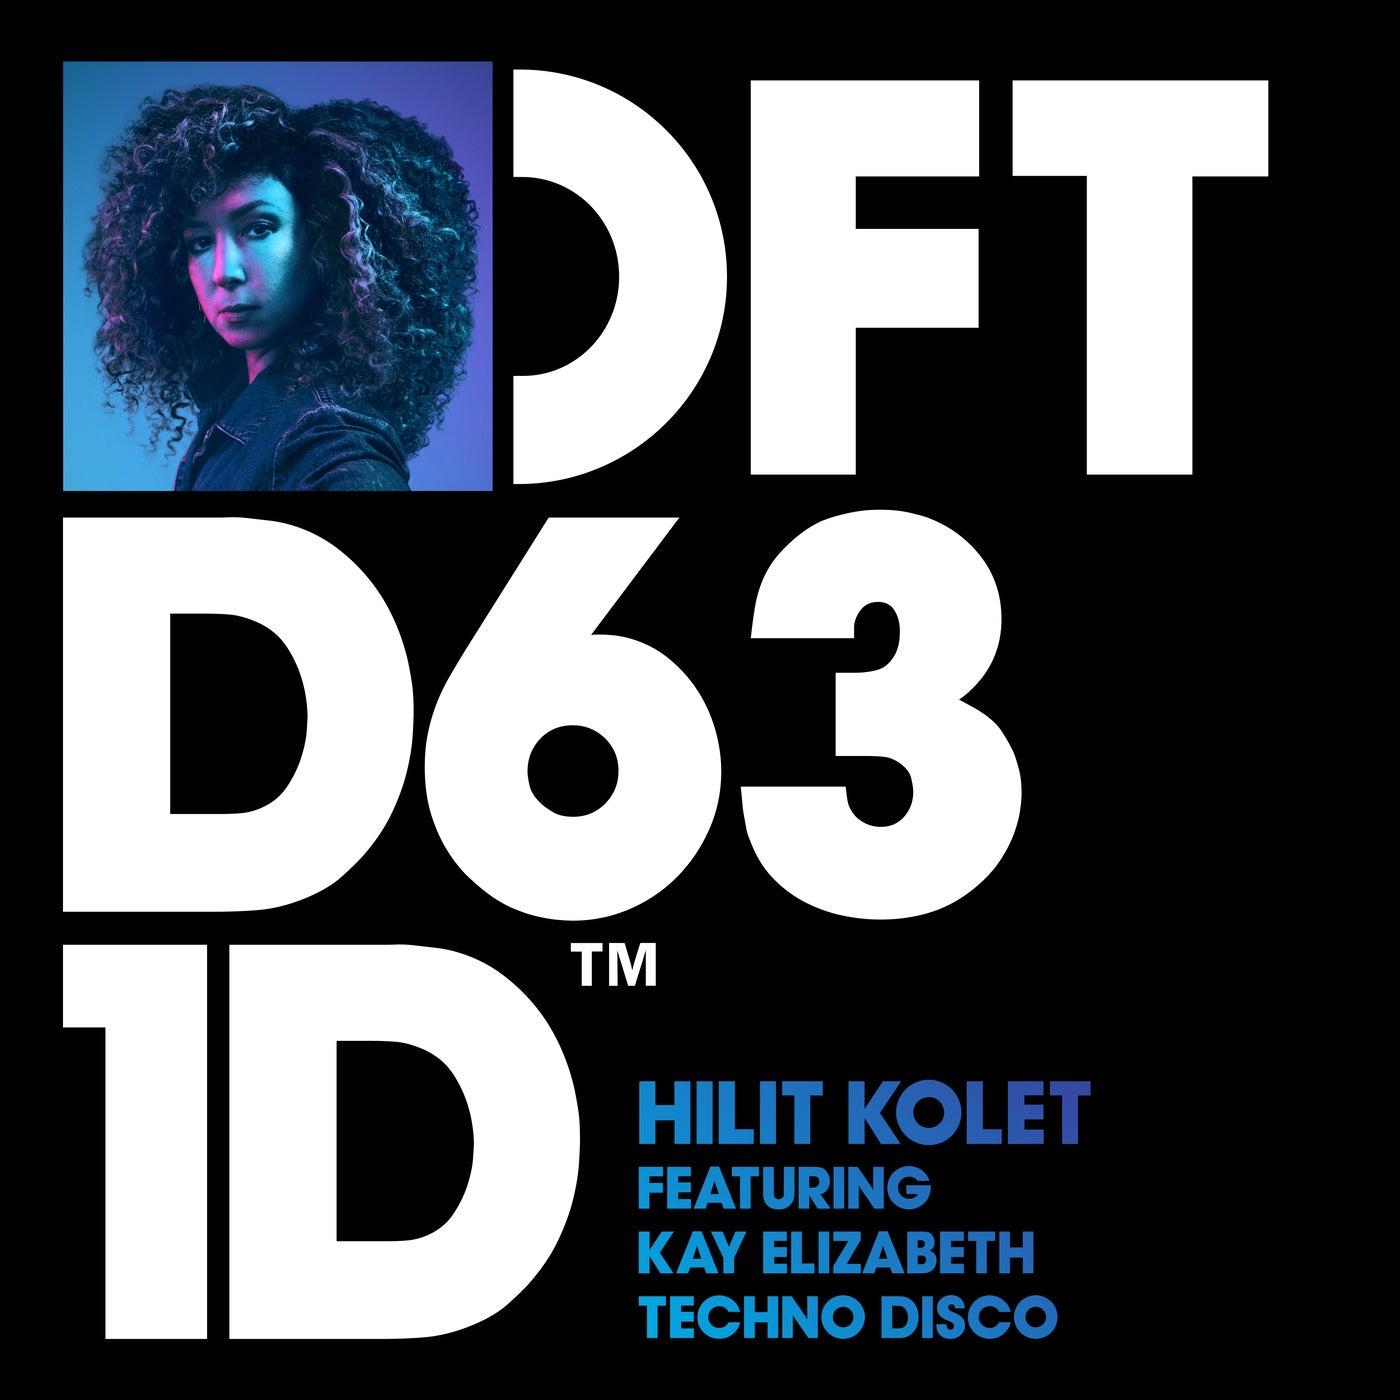 Techno Disco feat. Kay Elizabeth (Extended Mix)